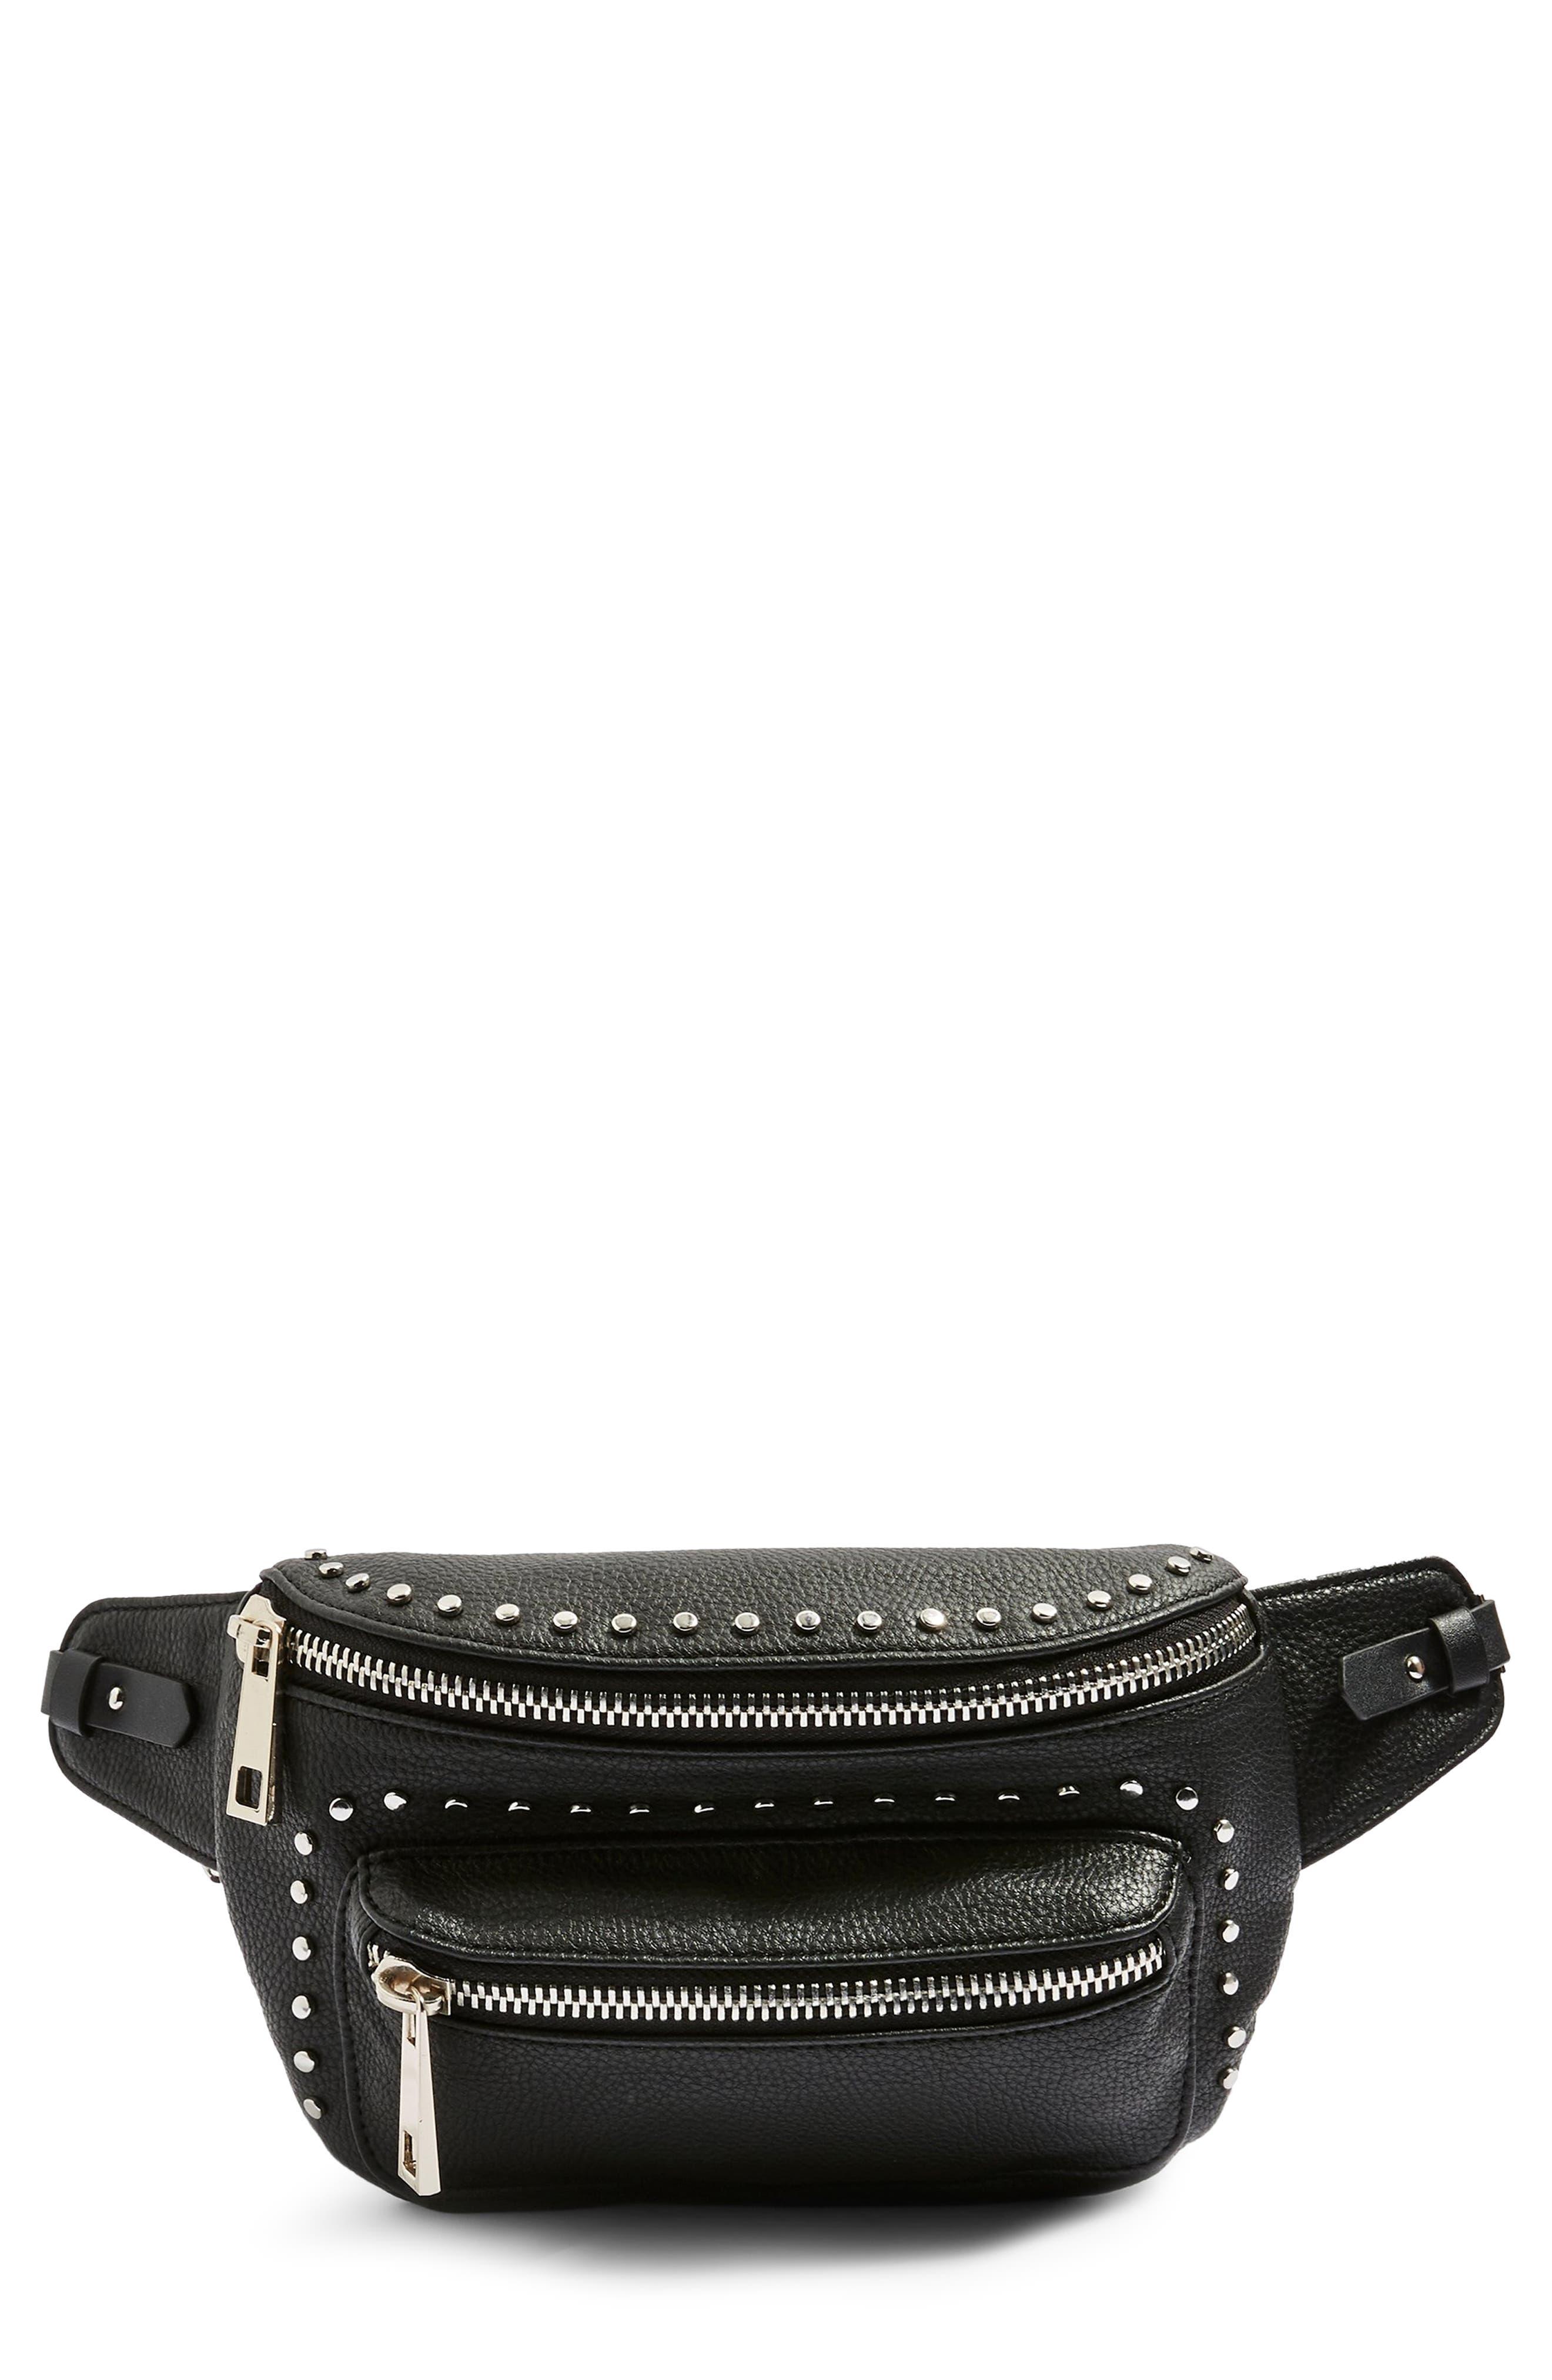 Branden Chain Belt Bag,                             Main thumbnail 1, color,                             BLACK